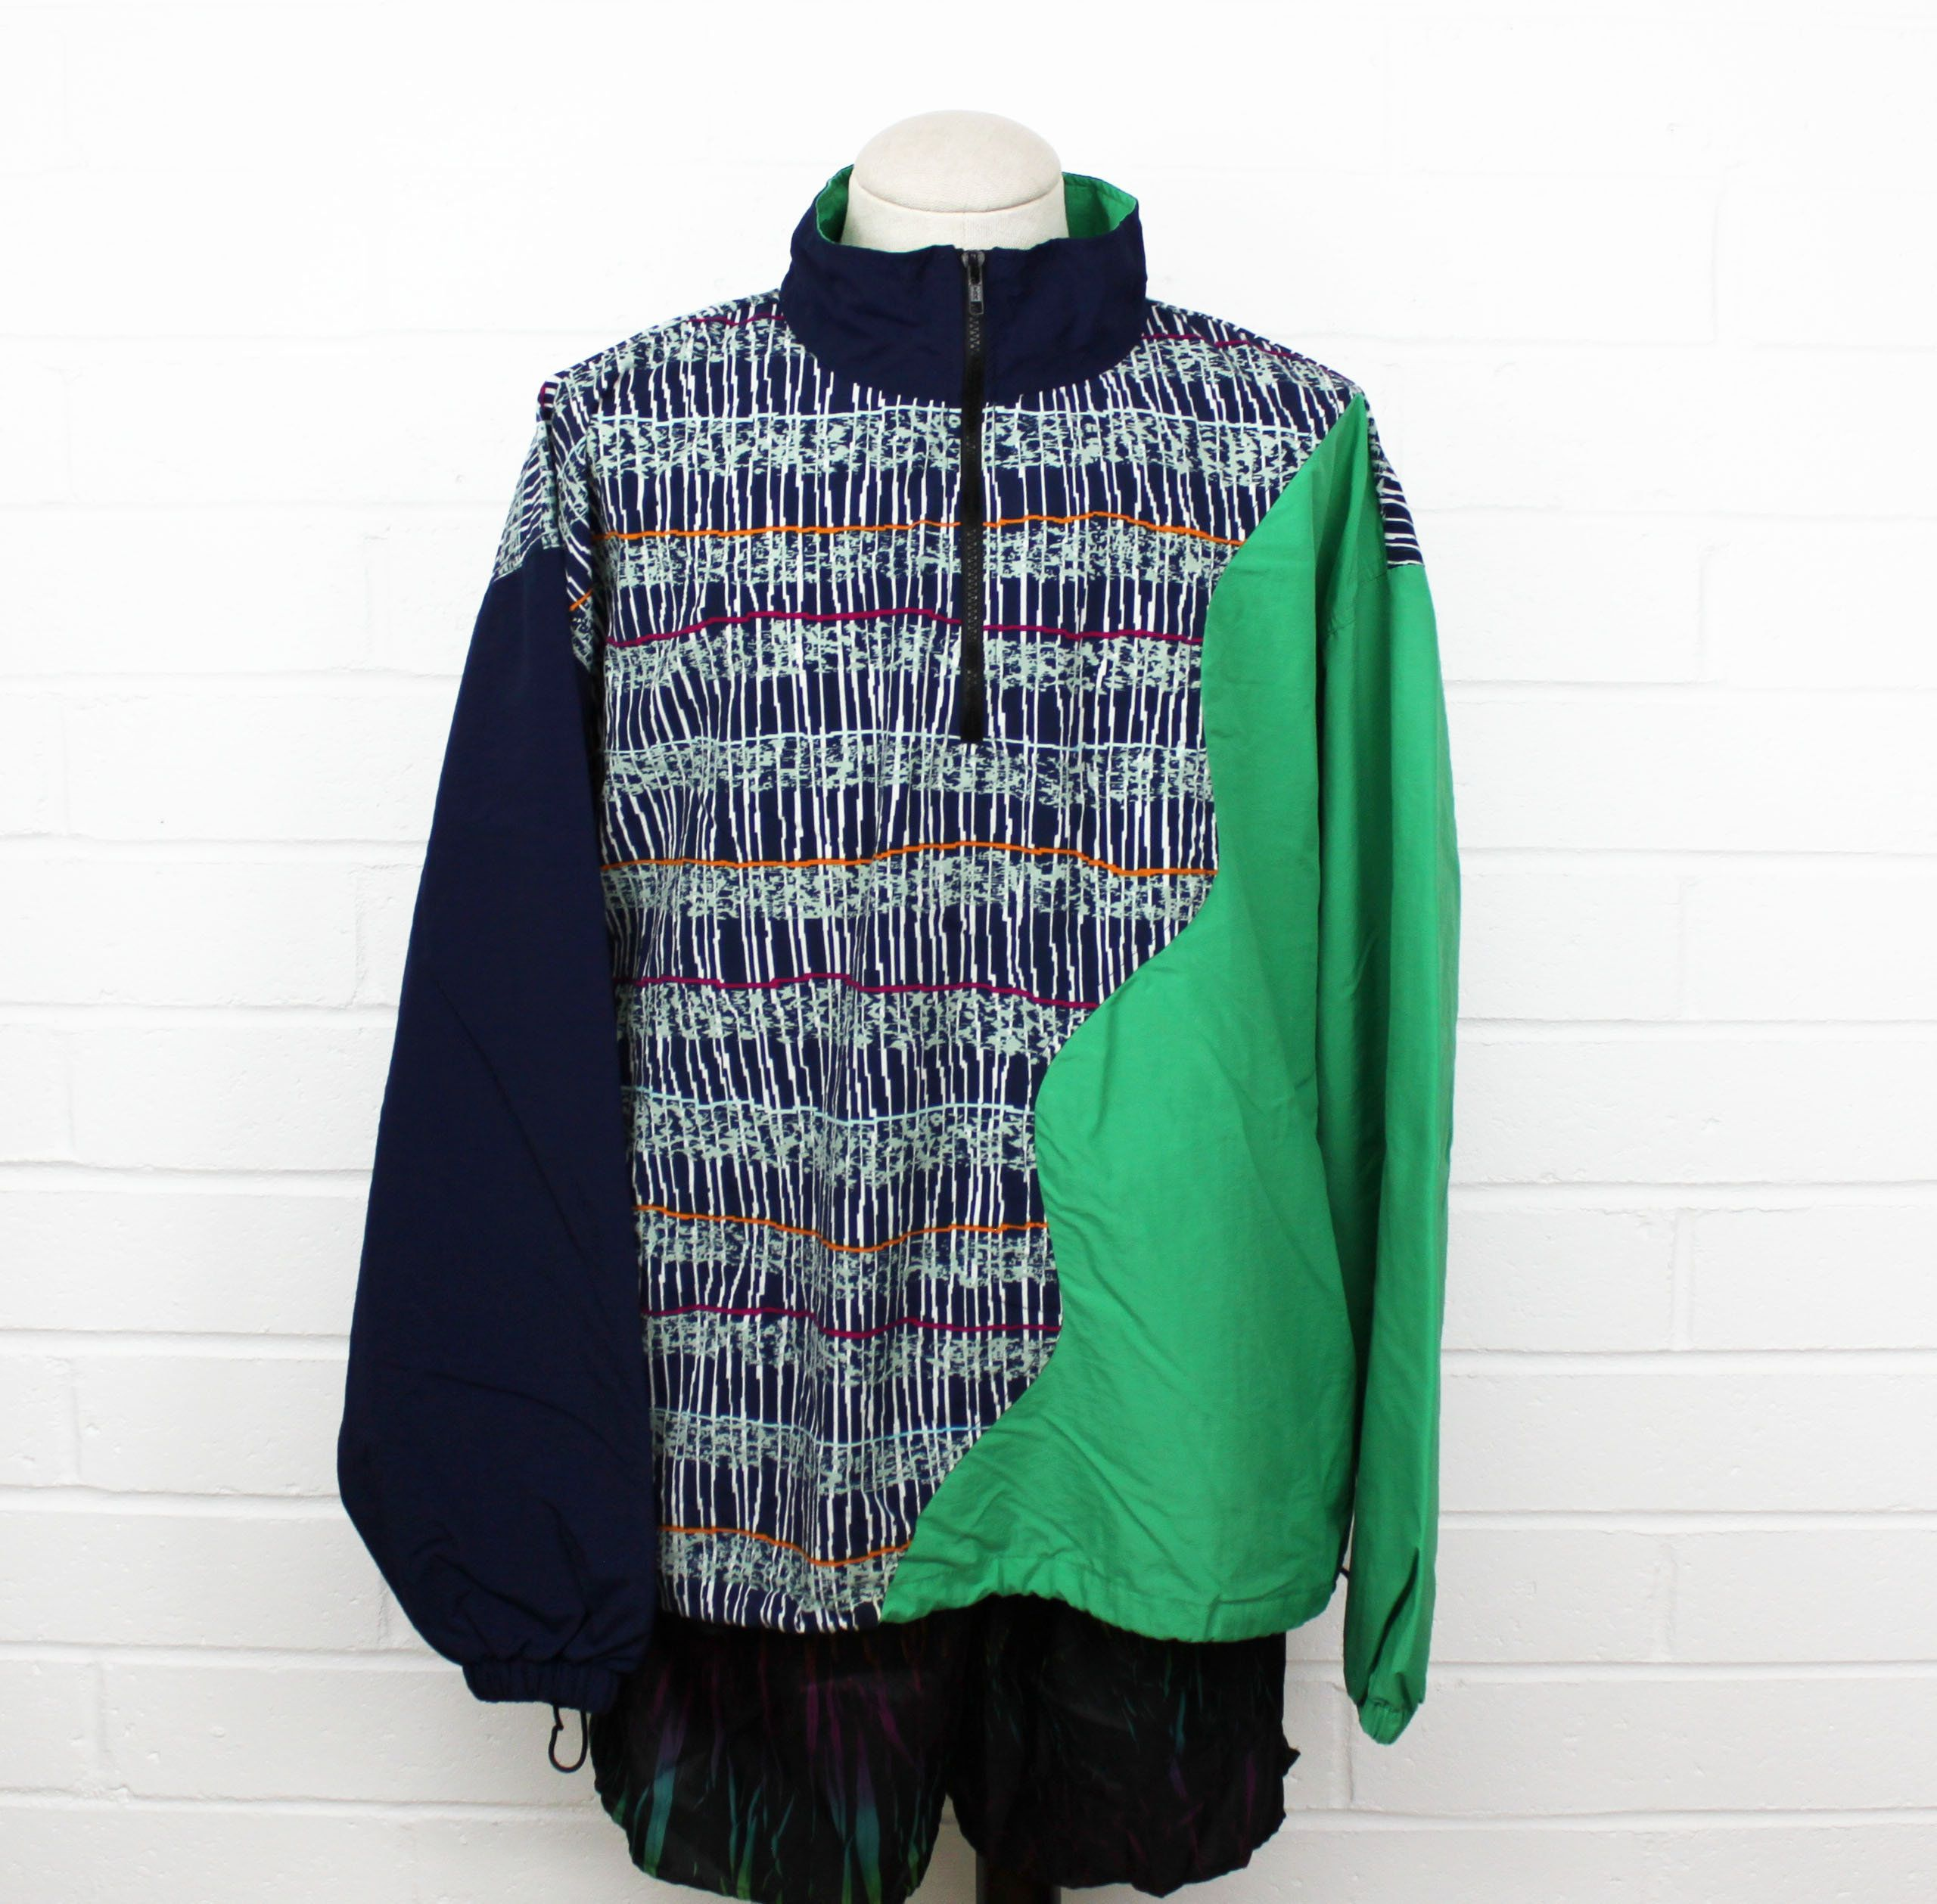 Vintage 90s Colorful Windbreaker Jacket Greg Norman Golf Light Etsy Windbreaker Jacket Colorful Windbreaker Jackets